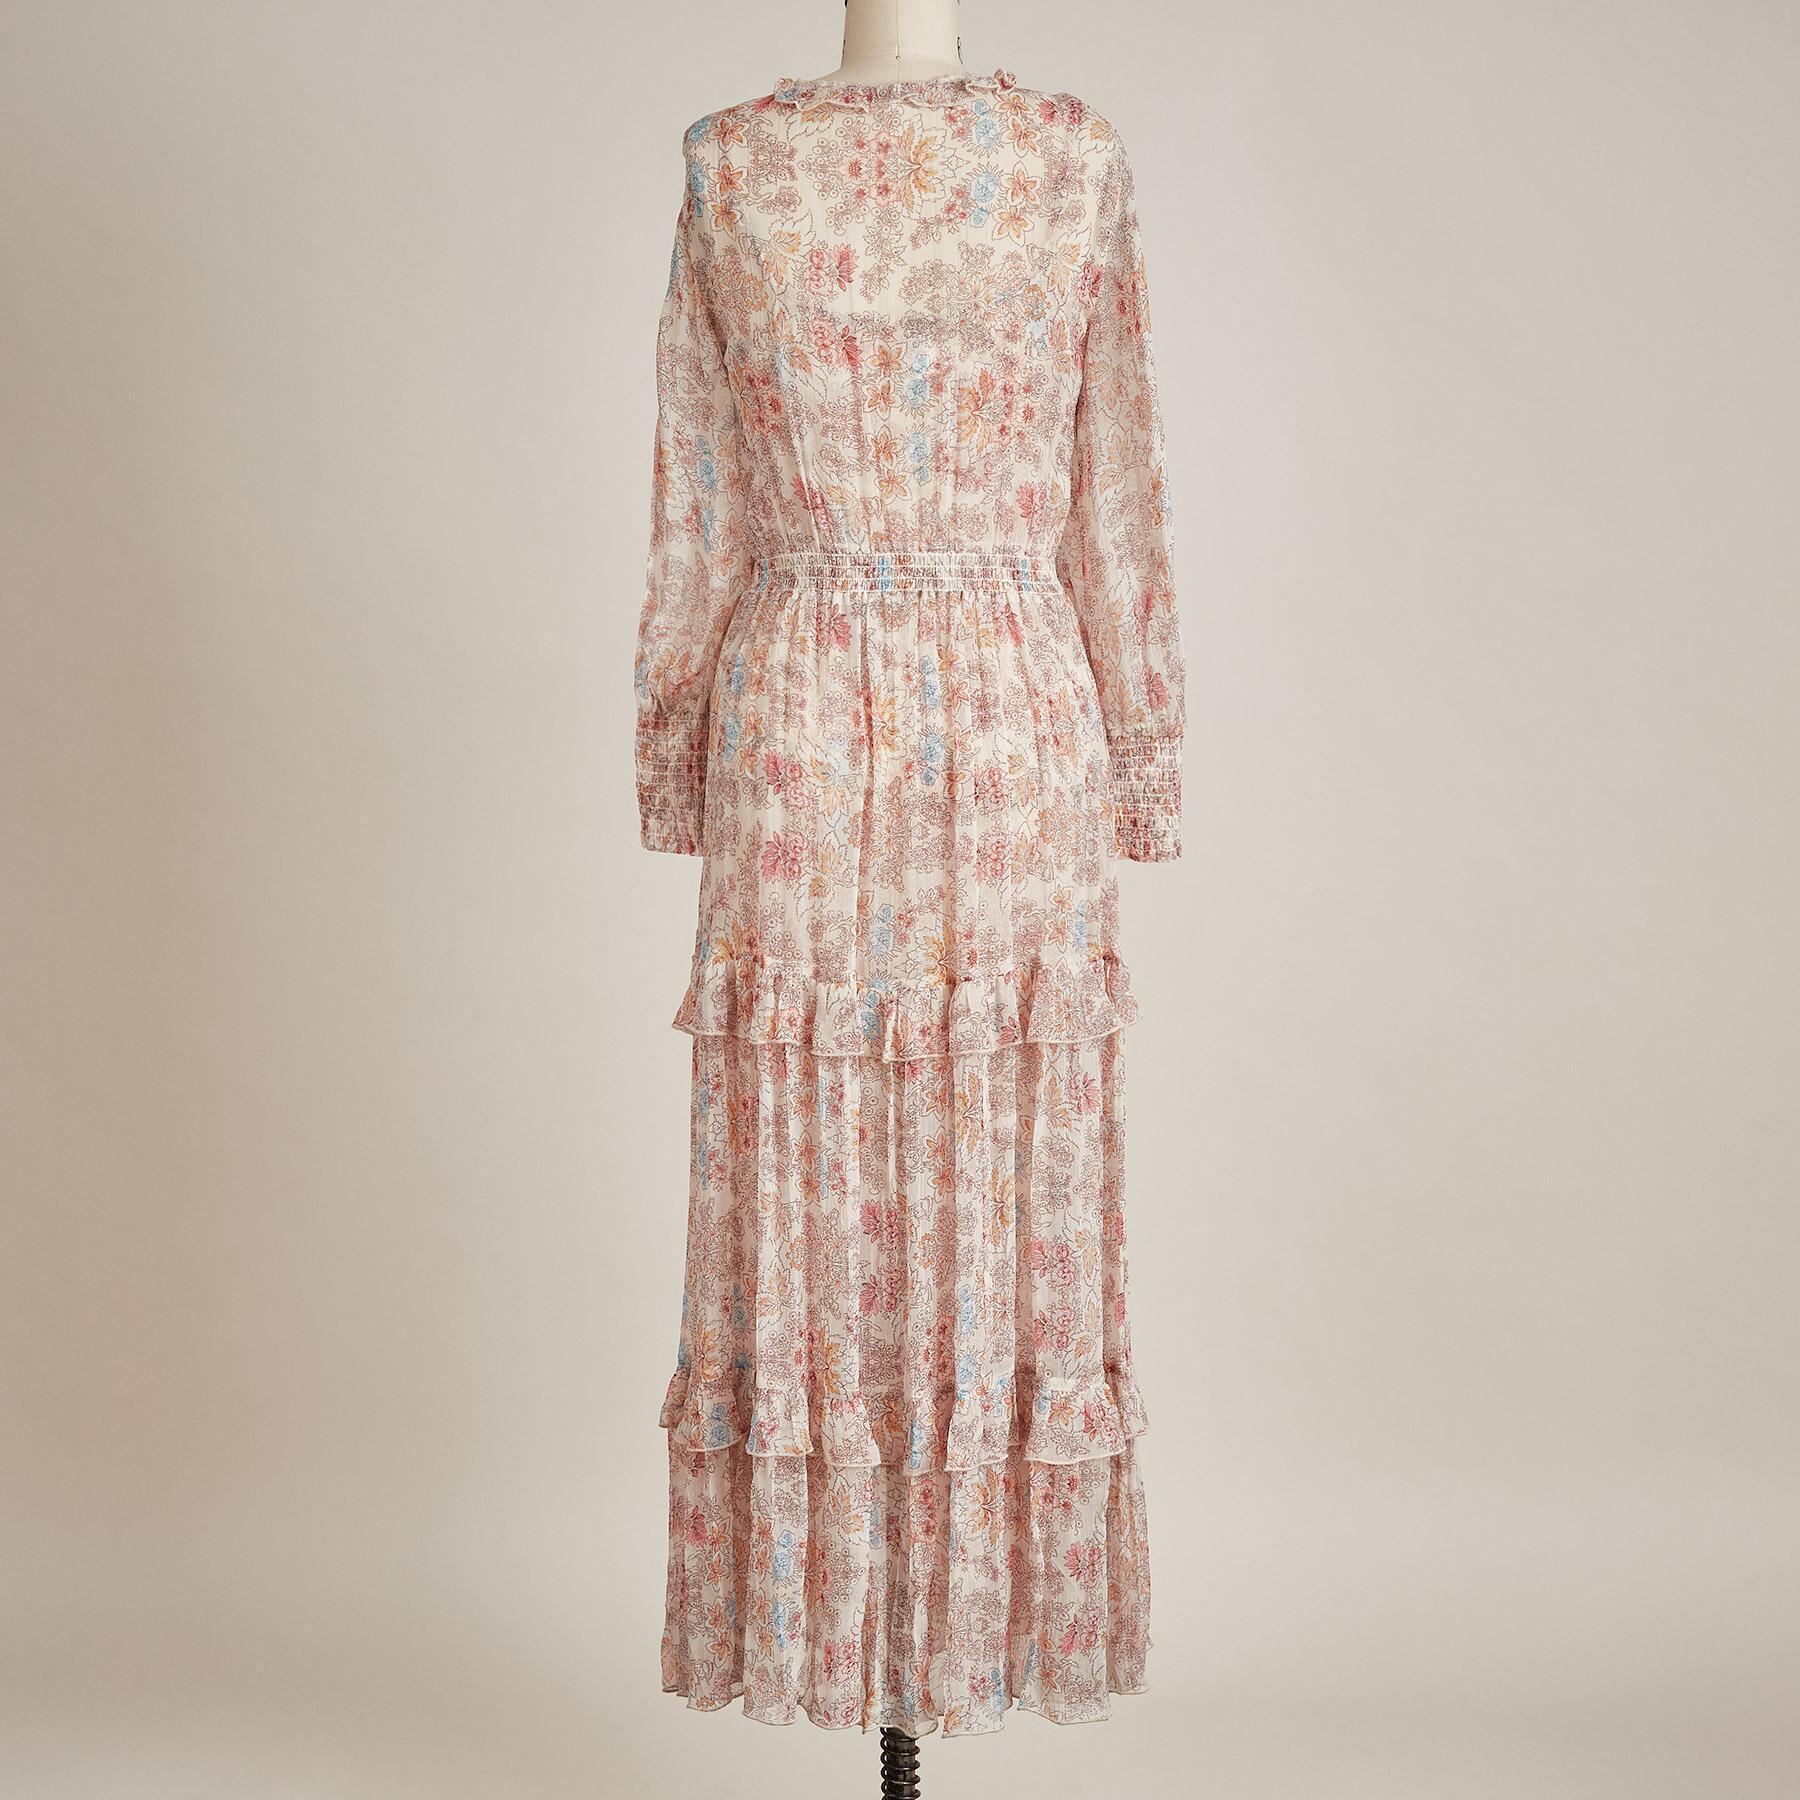 WILD DESERT BLOOM DRESS - PETITES: View 3